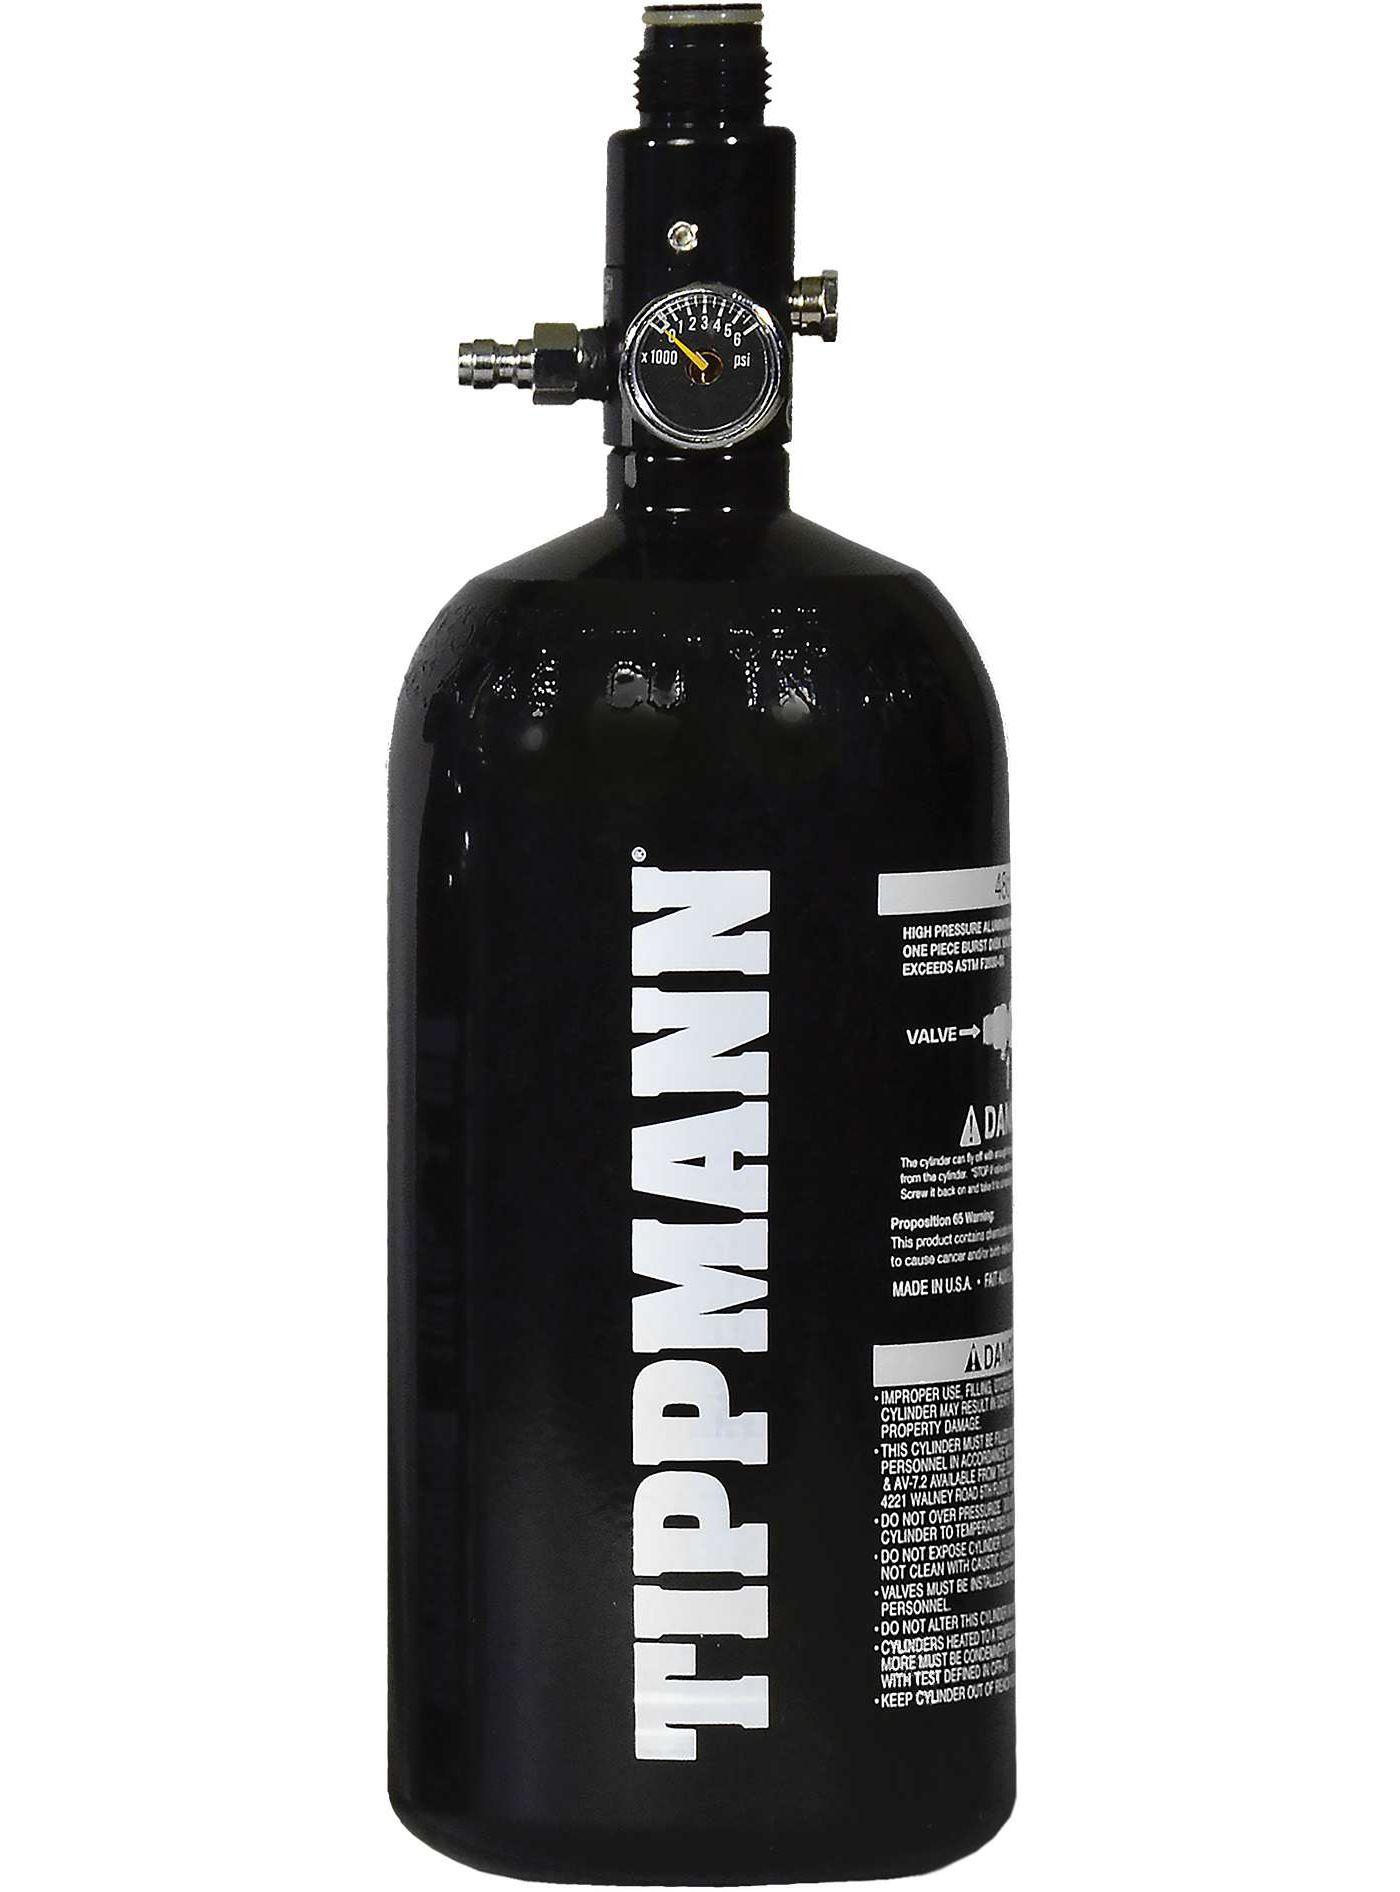 Tippmann .48/3000 High Pressure Compressed Air Tank